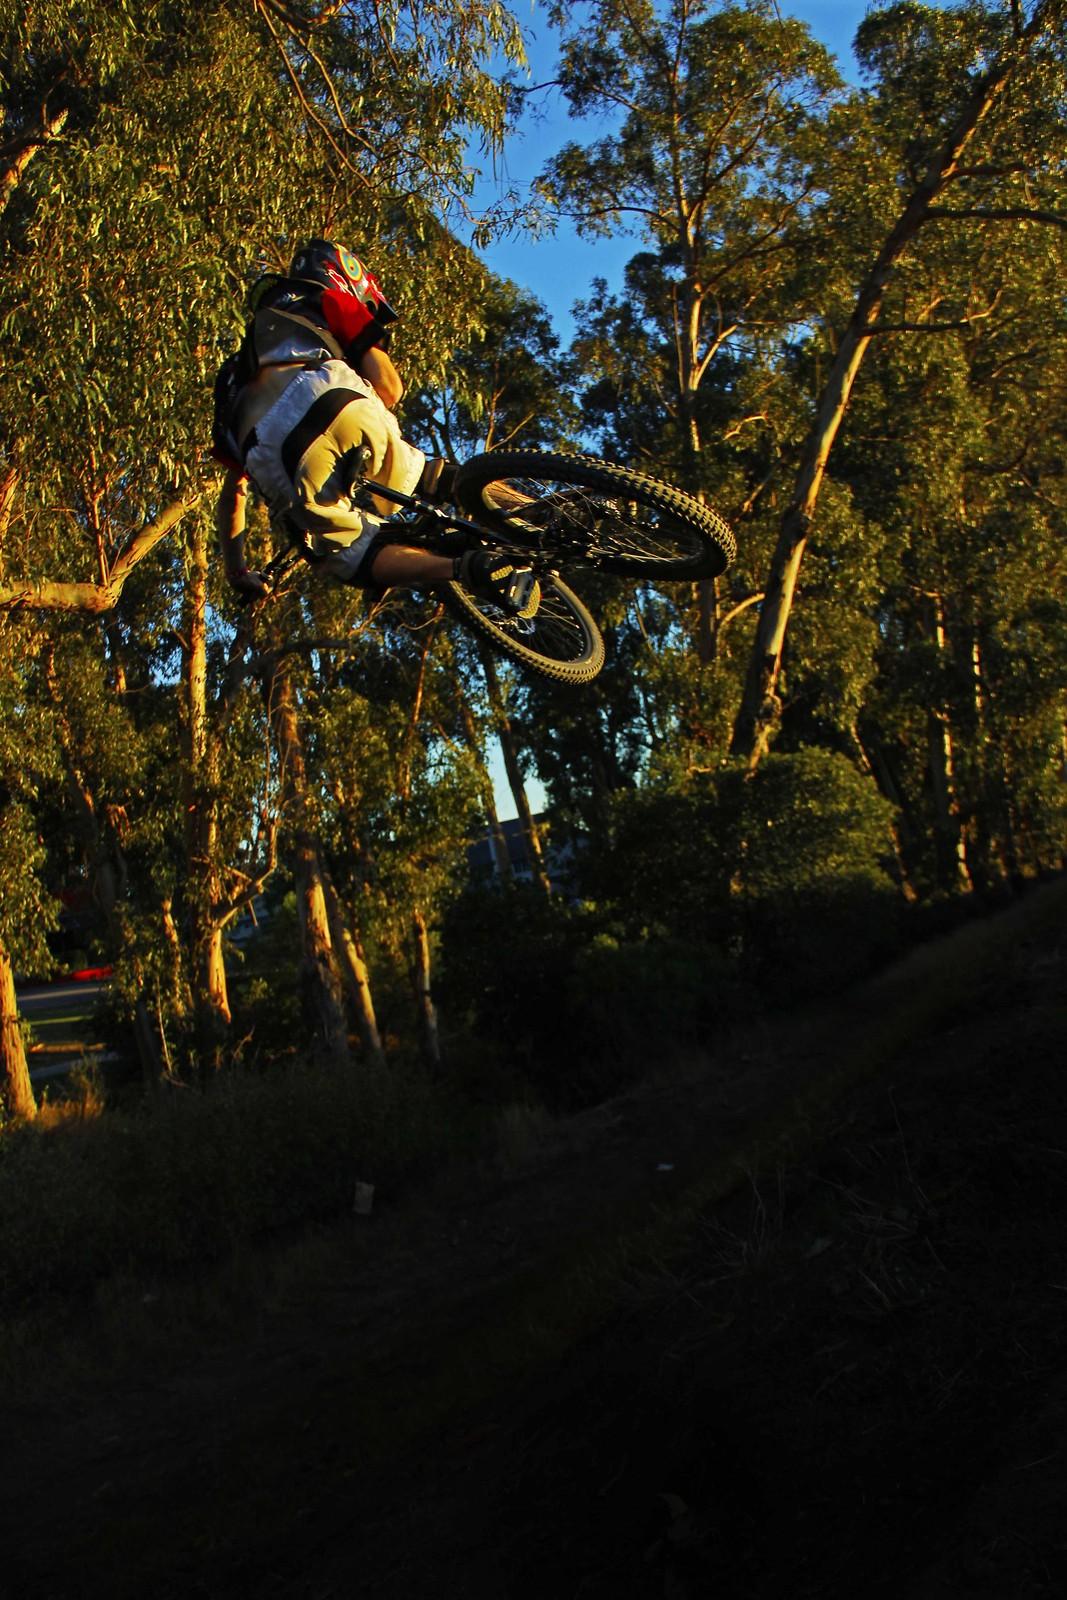 rear hip shot - GnarHuck - Mountain Biking Pictures - Vital MTB